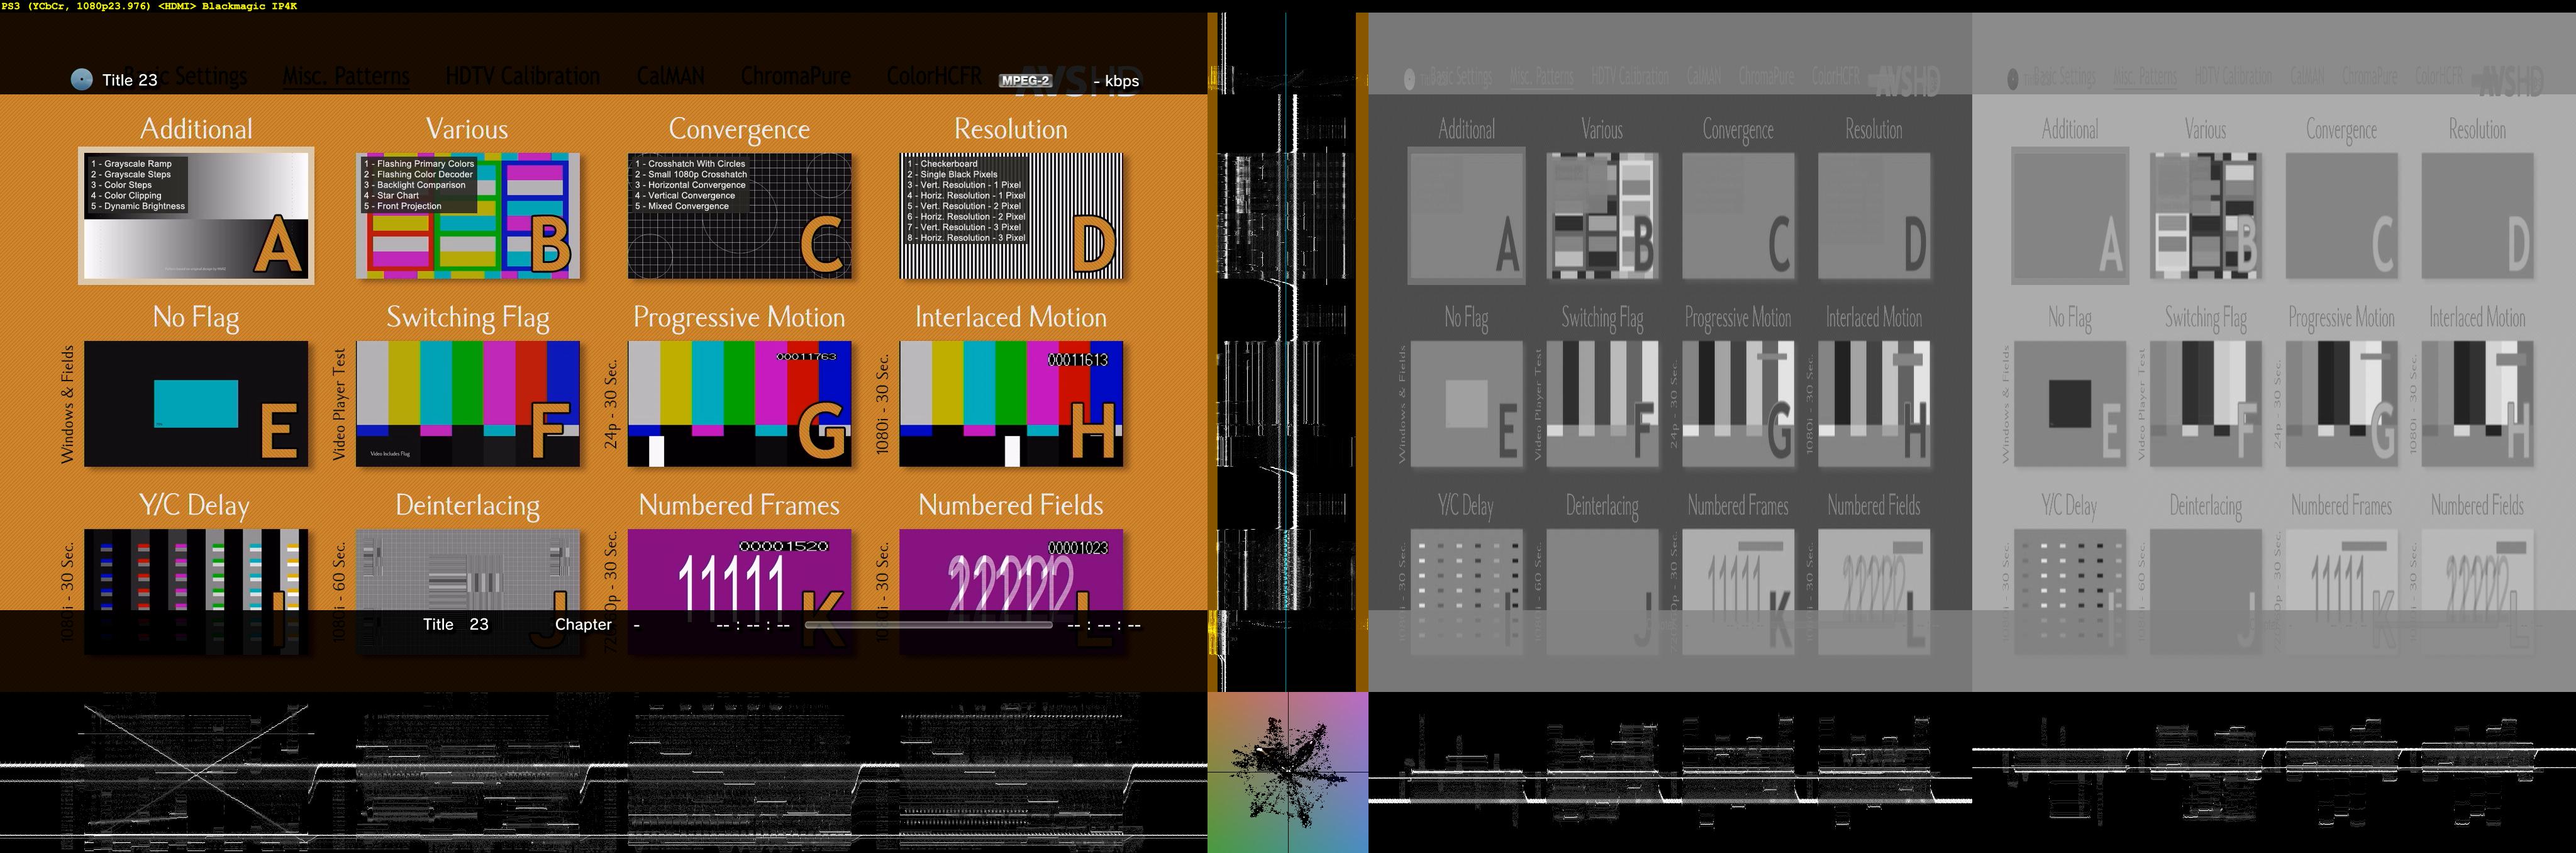 Click image for larger version  Name:AVS HD 709 BD menu - PS3, YCbCr =HDMI= IP4K.png Views:3103 Size:2.11 MB ID:35269